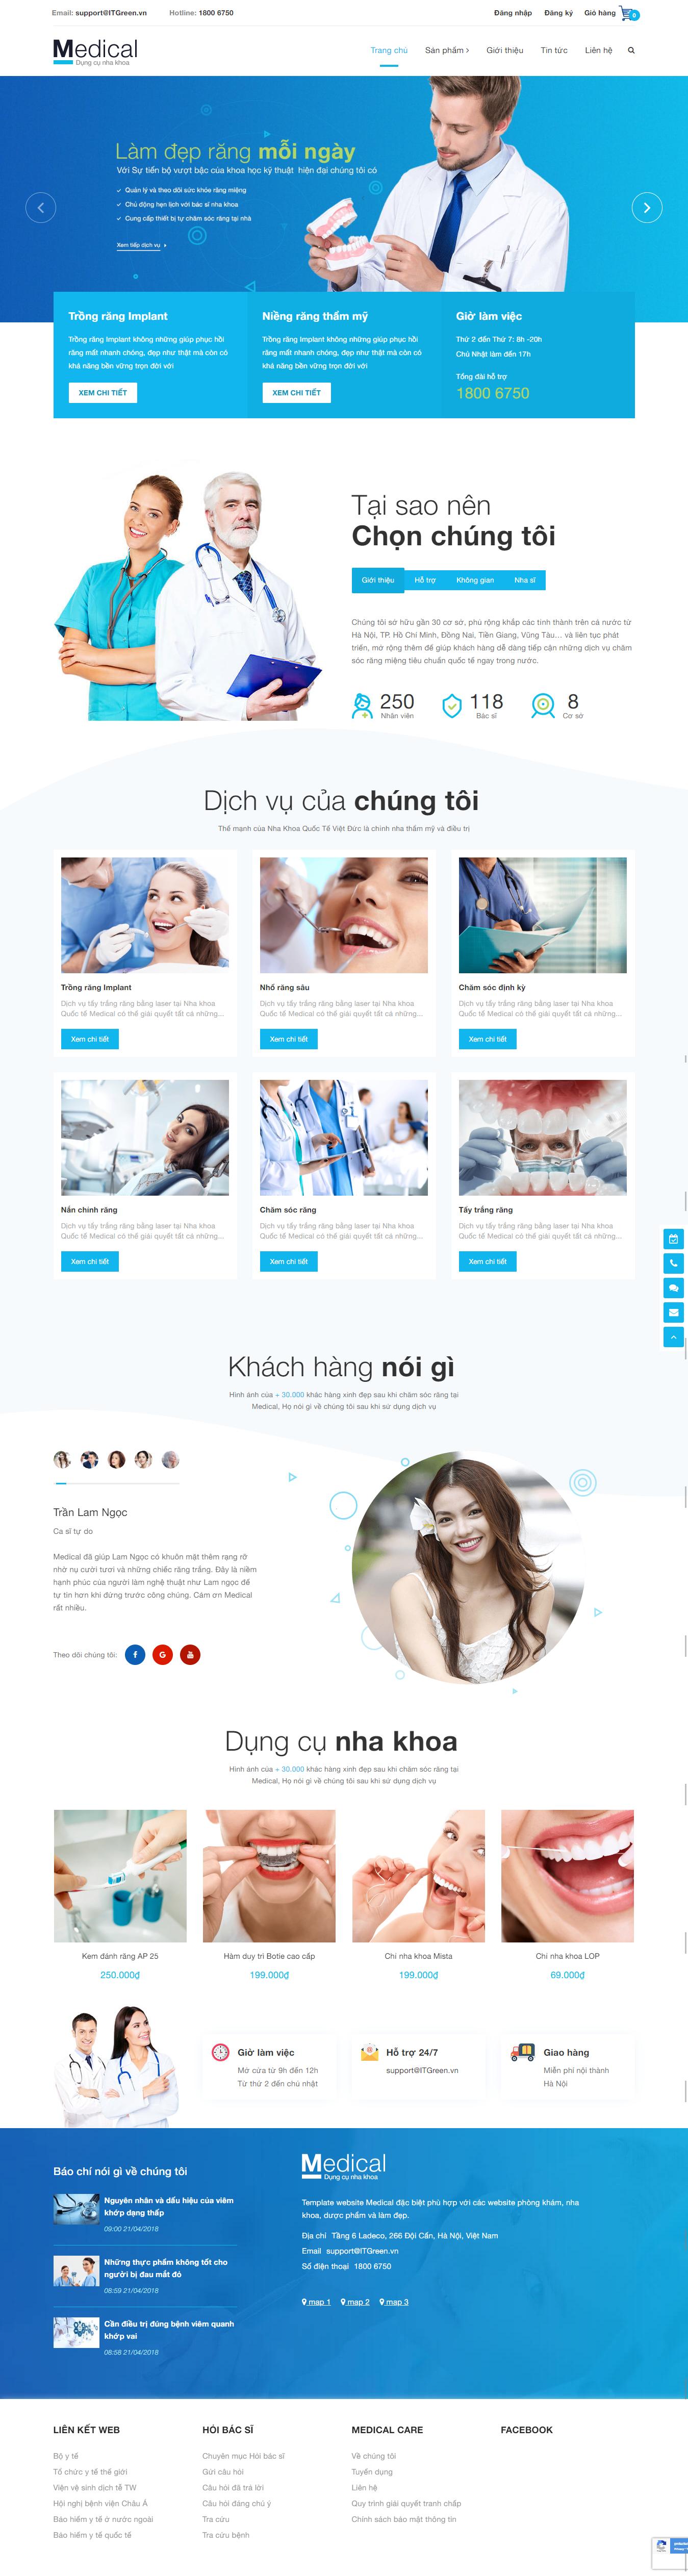 Thiết kế website Thiết kế website dịch vụ Medical